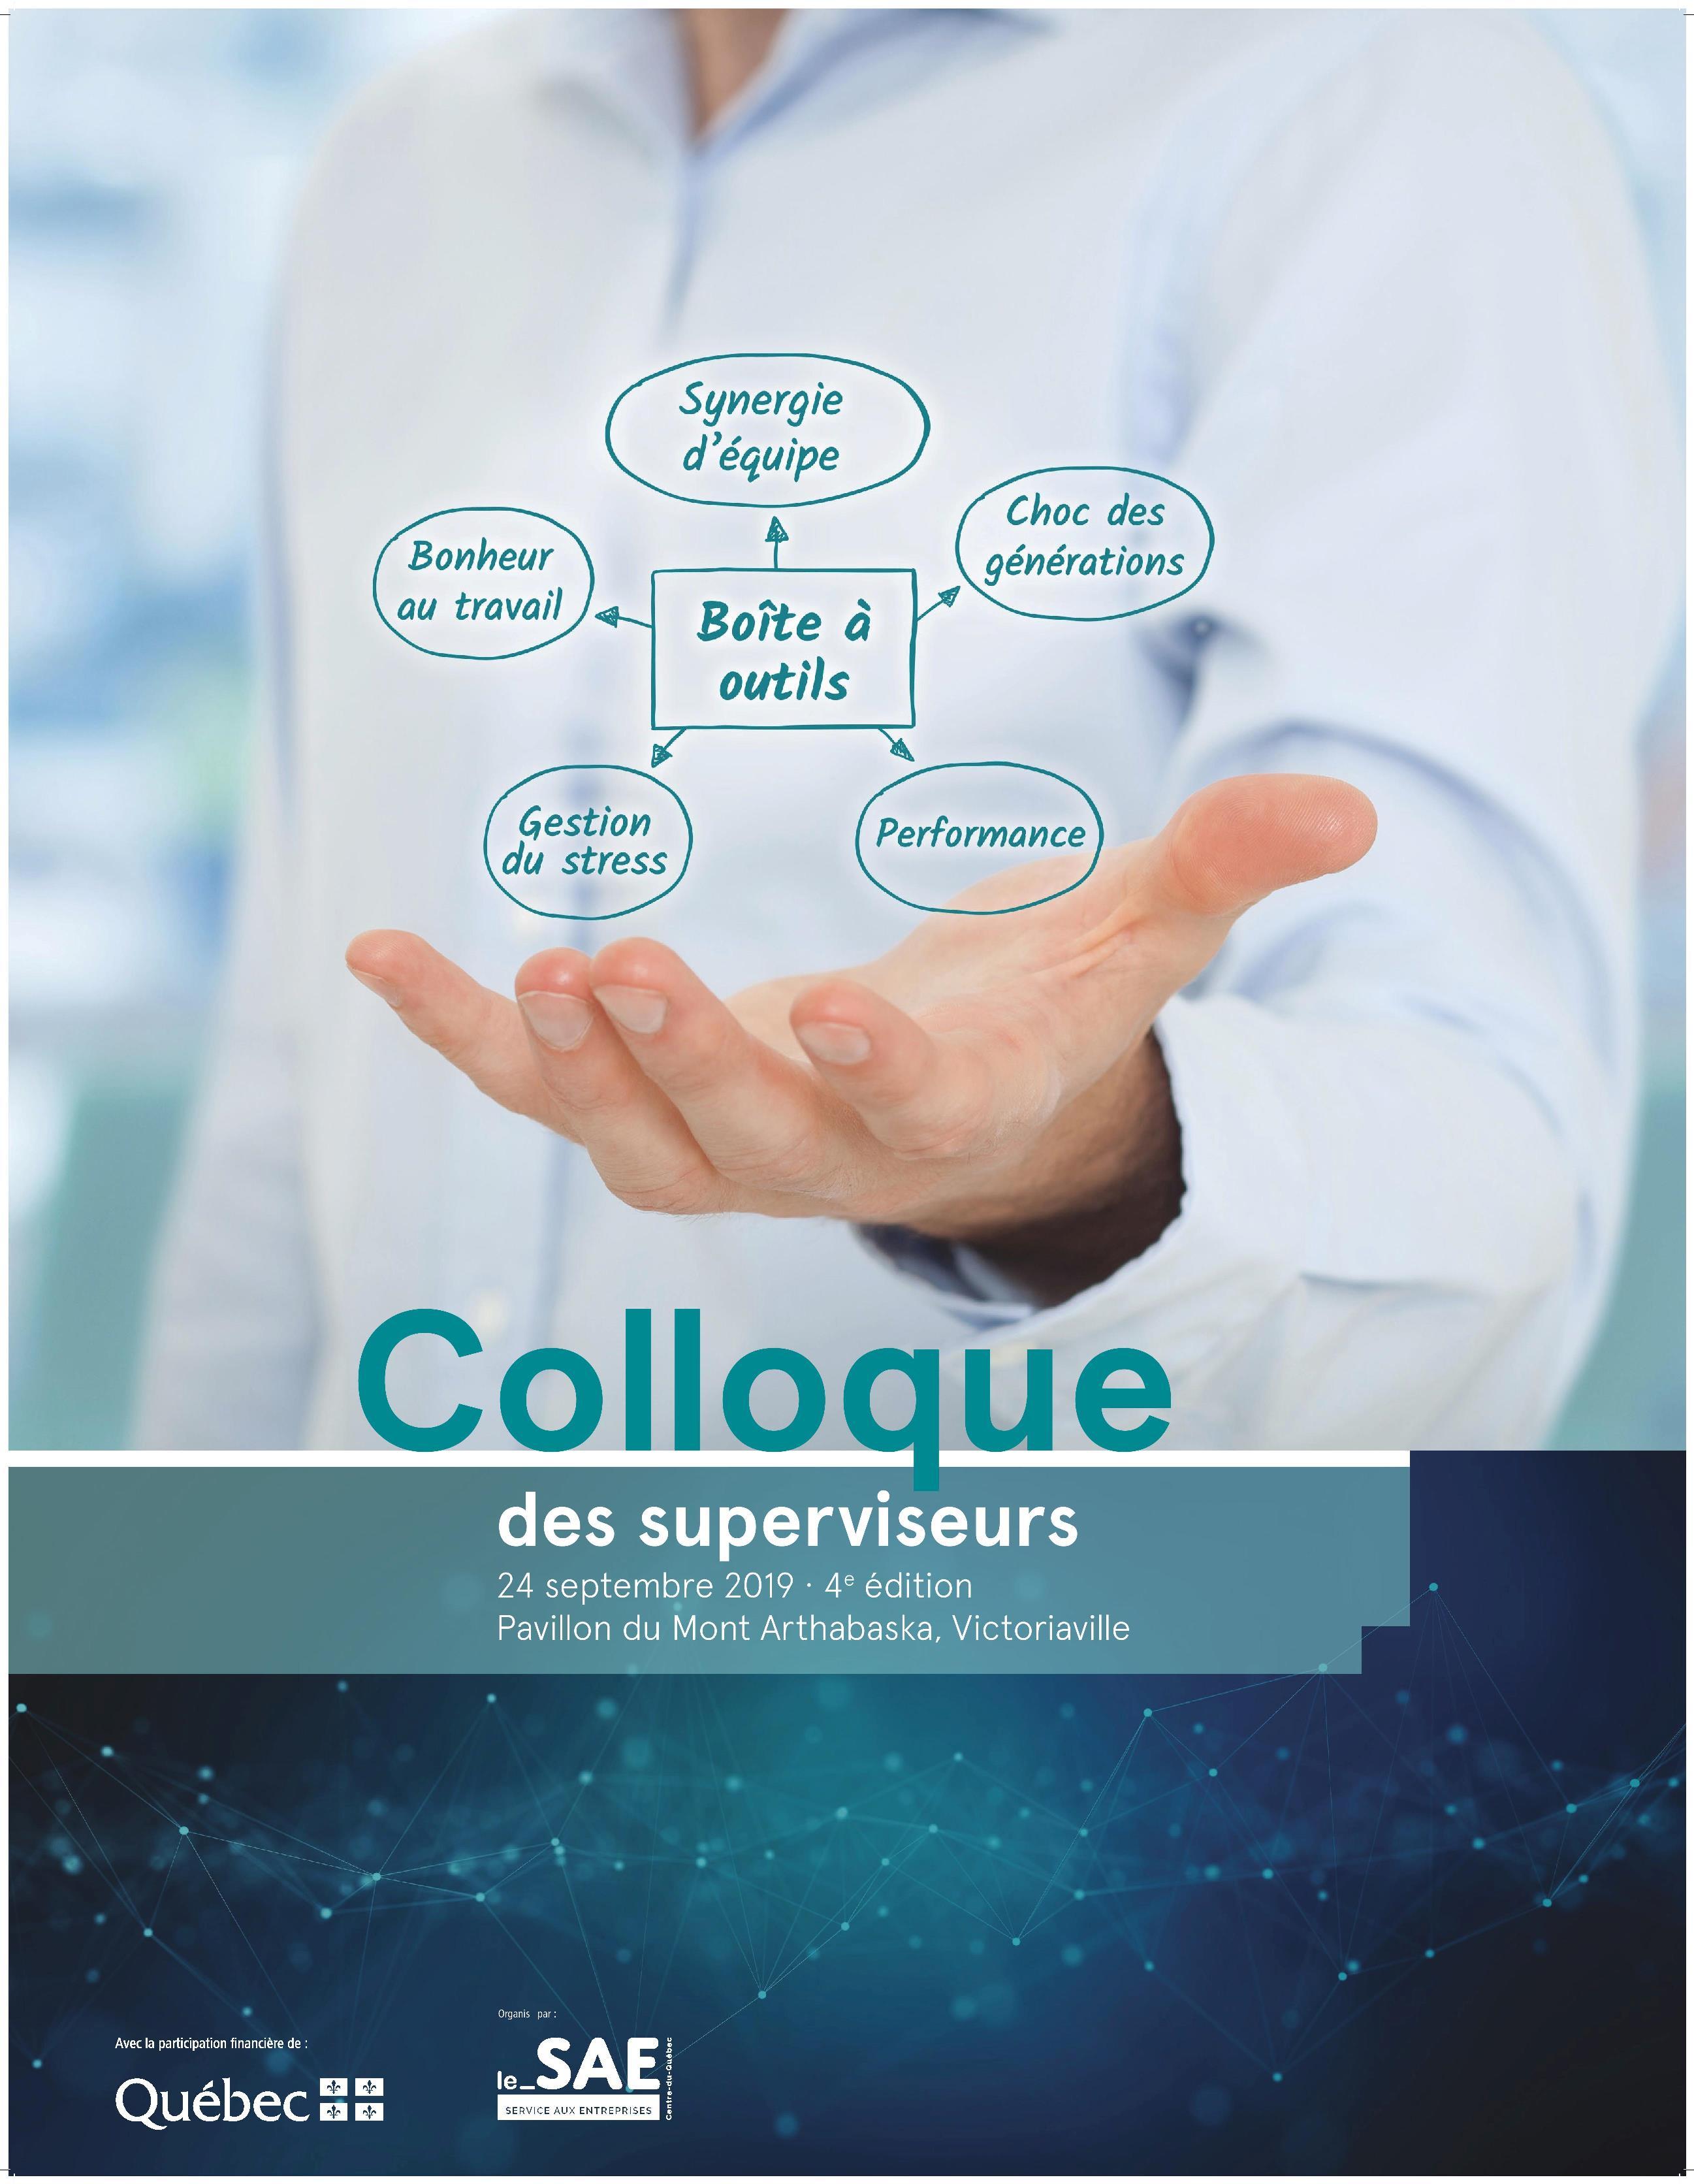 Colloque superviseurs Arthabaska-Érable 2019